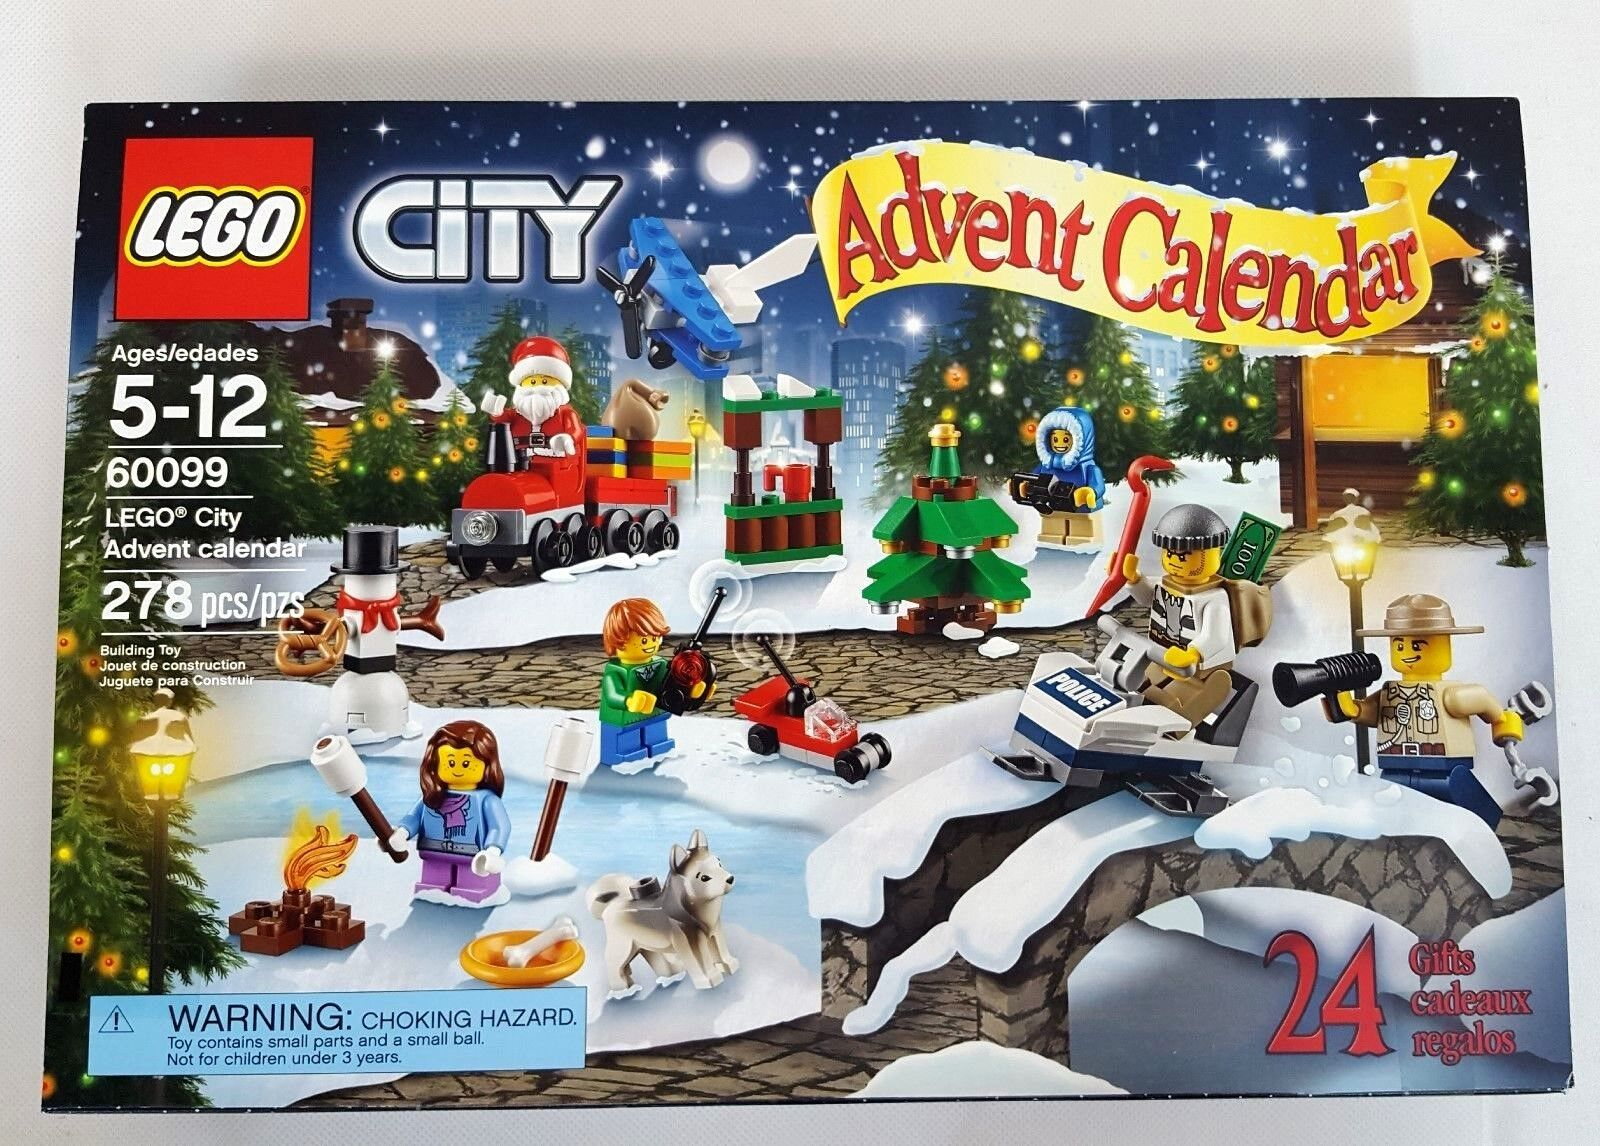 LEGO CITY 2015 Christmas ADVENT CALENDAR  60099 Building Kit NEW SEALED in BOX